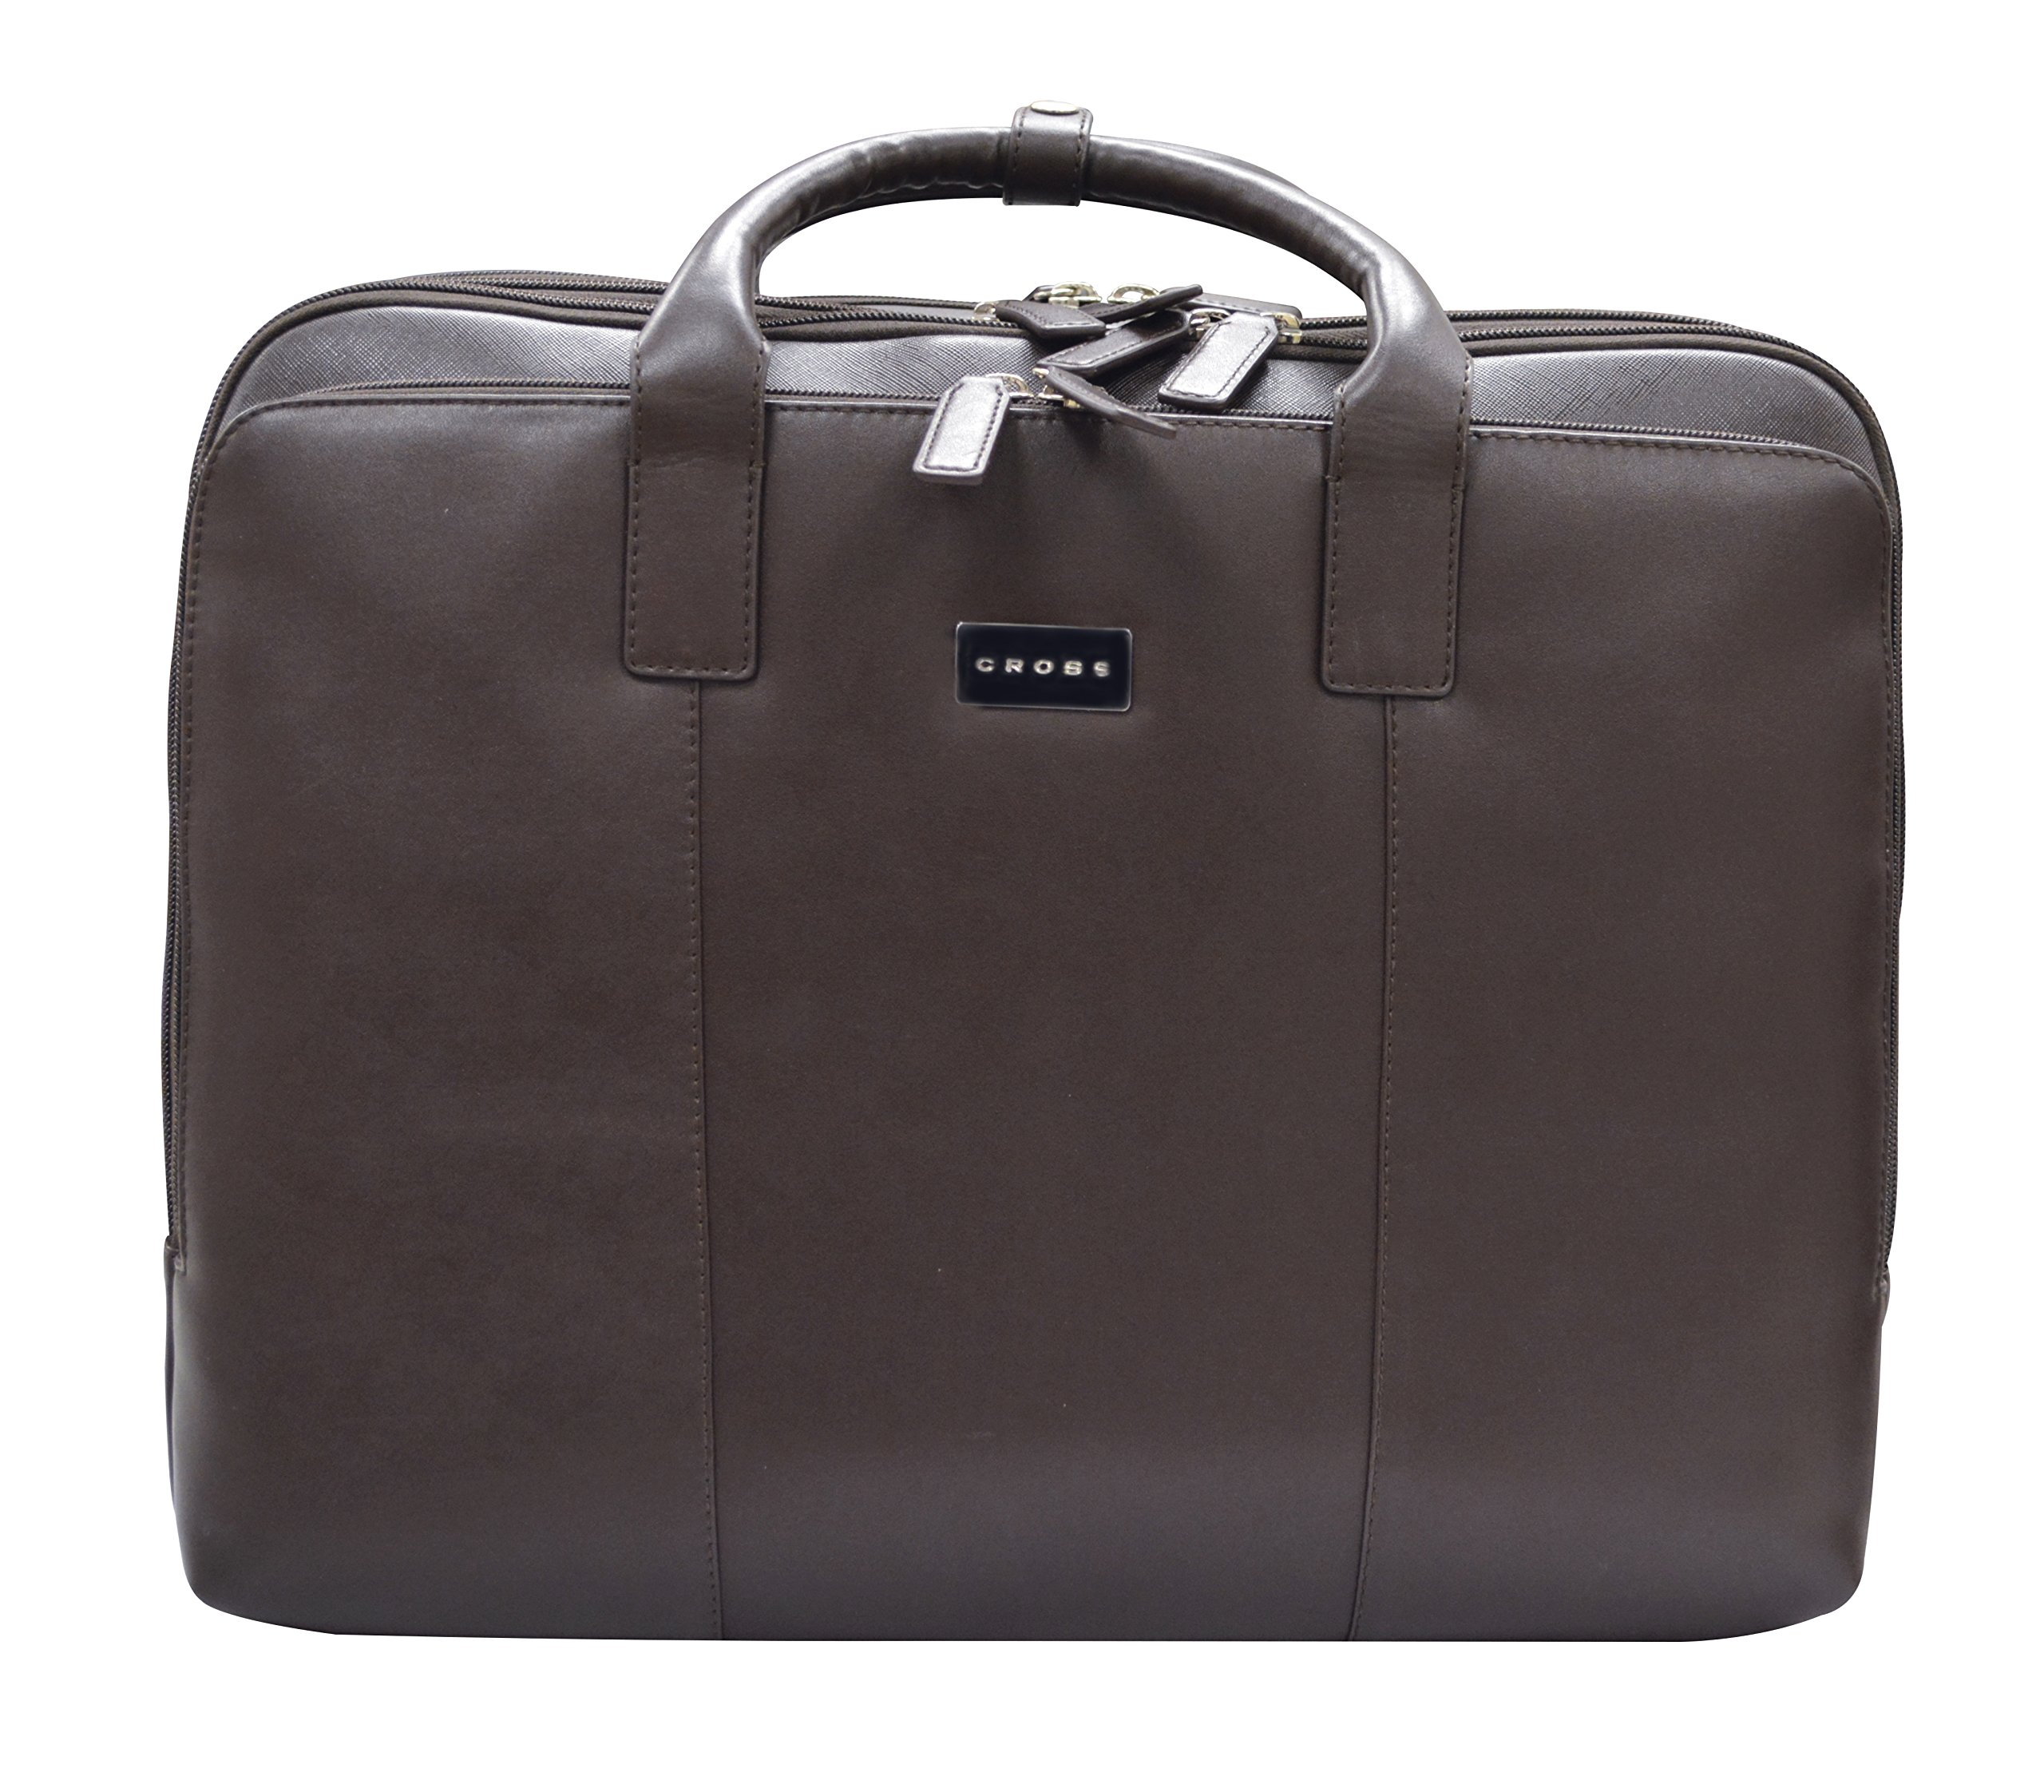 Cross Men's Artificial Leather Laptop / Office / Business / Weekender Briefcase - Oak Brown